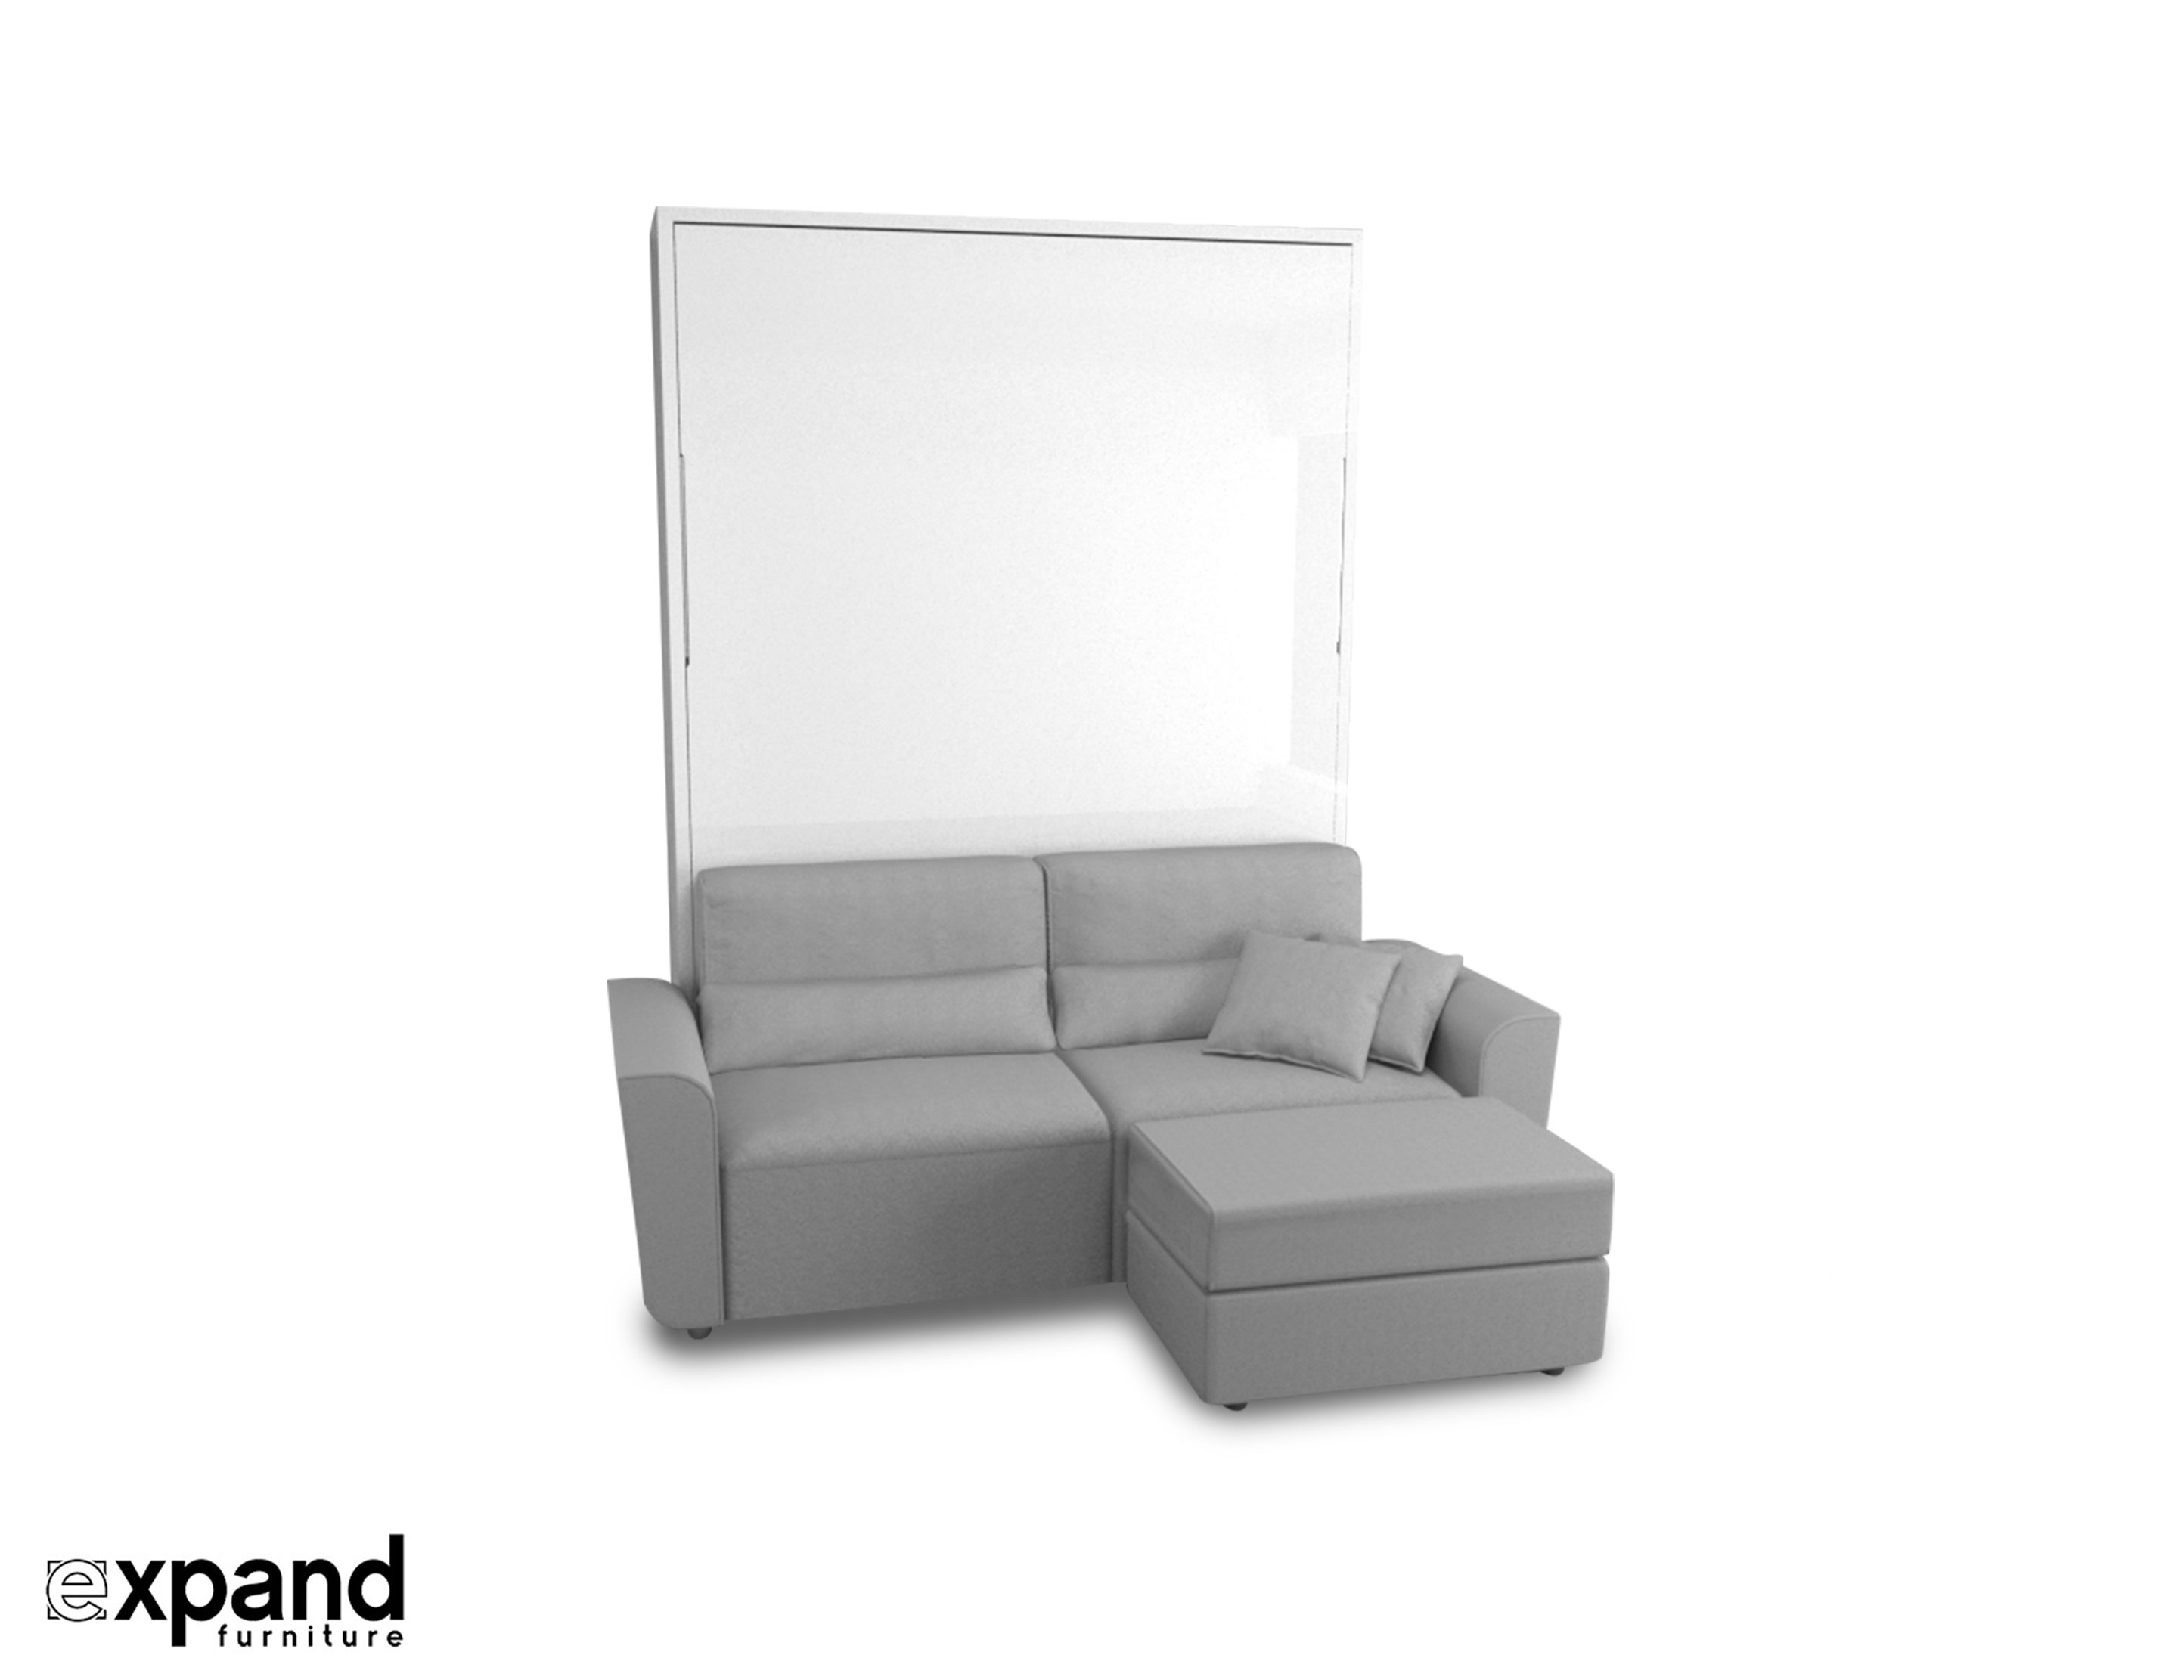 sofa murphy bed combination helena murphysofa minima expand furniture folding tables